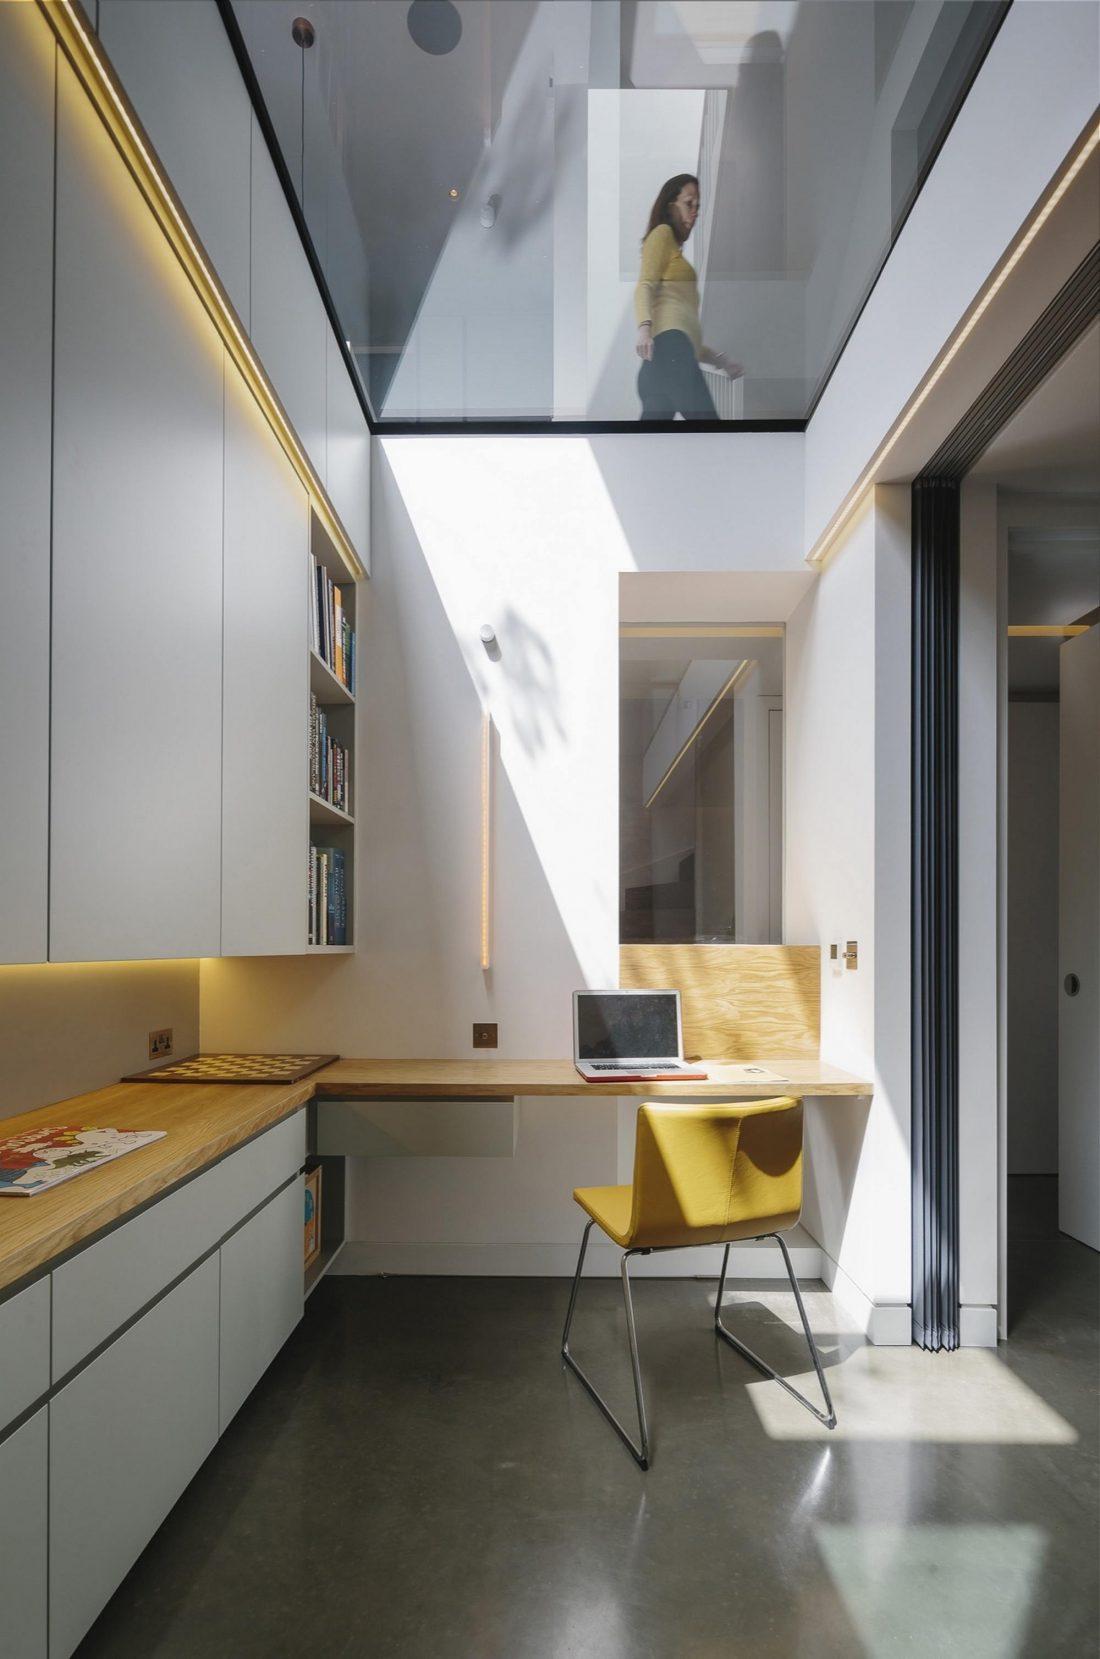 Дом Брекенбури от студии Neil Dusheiko Architects 9